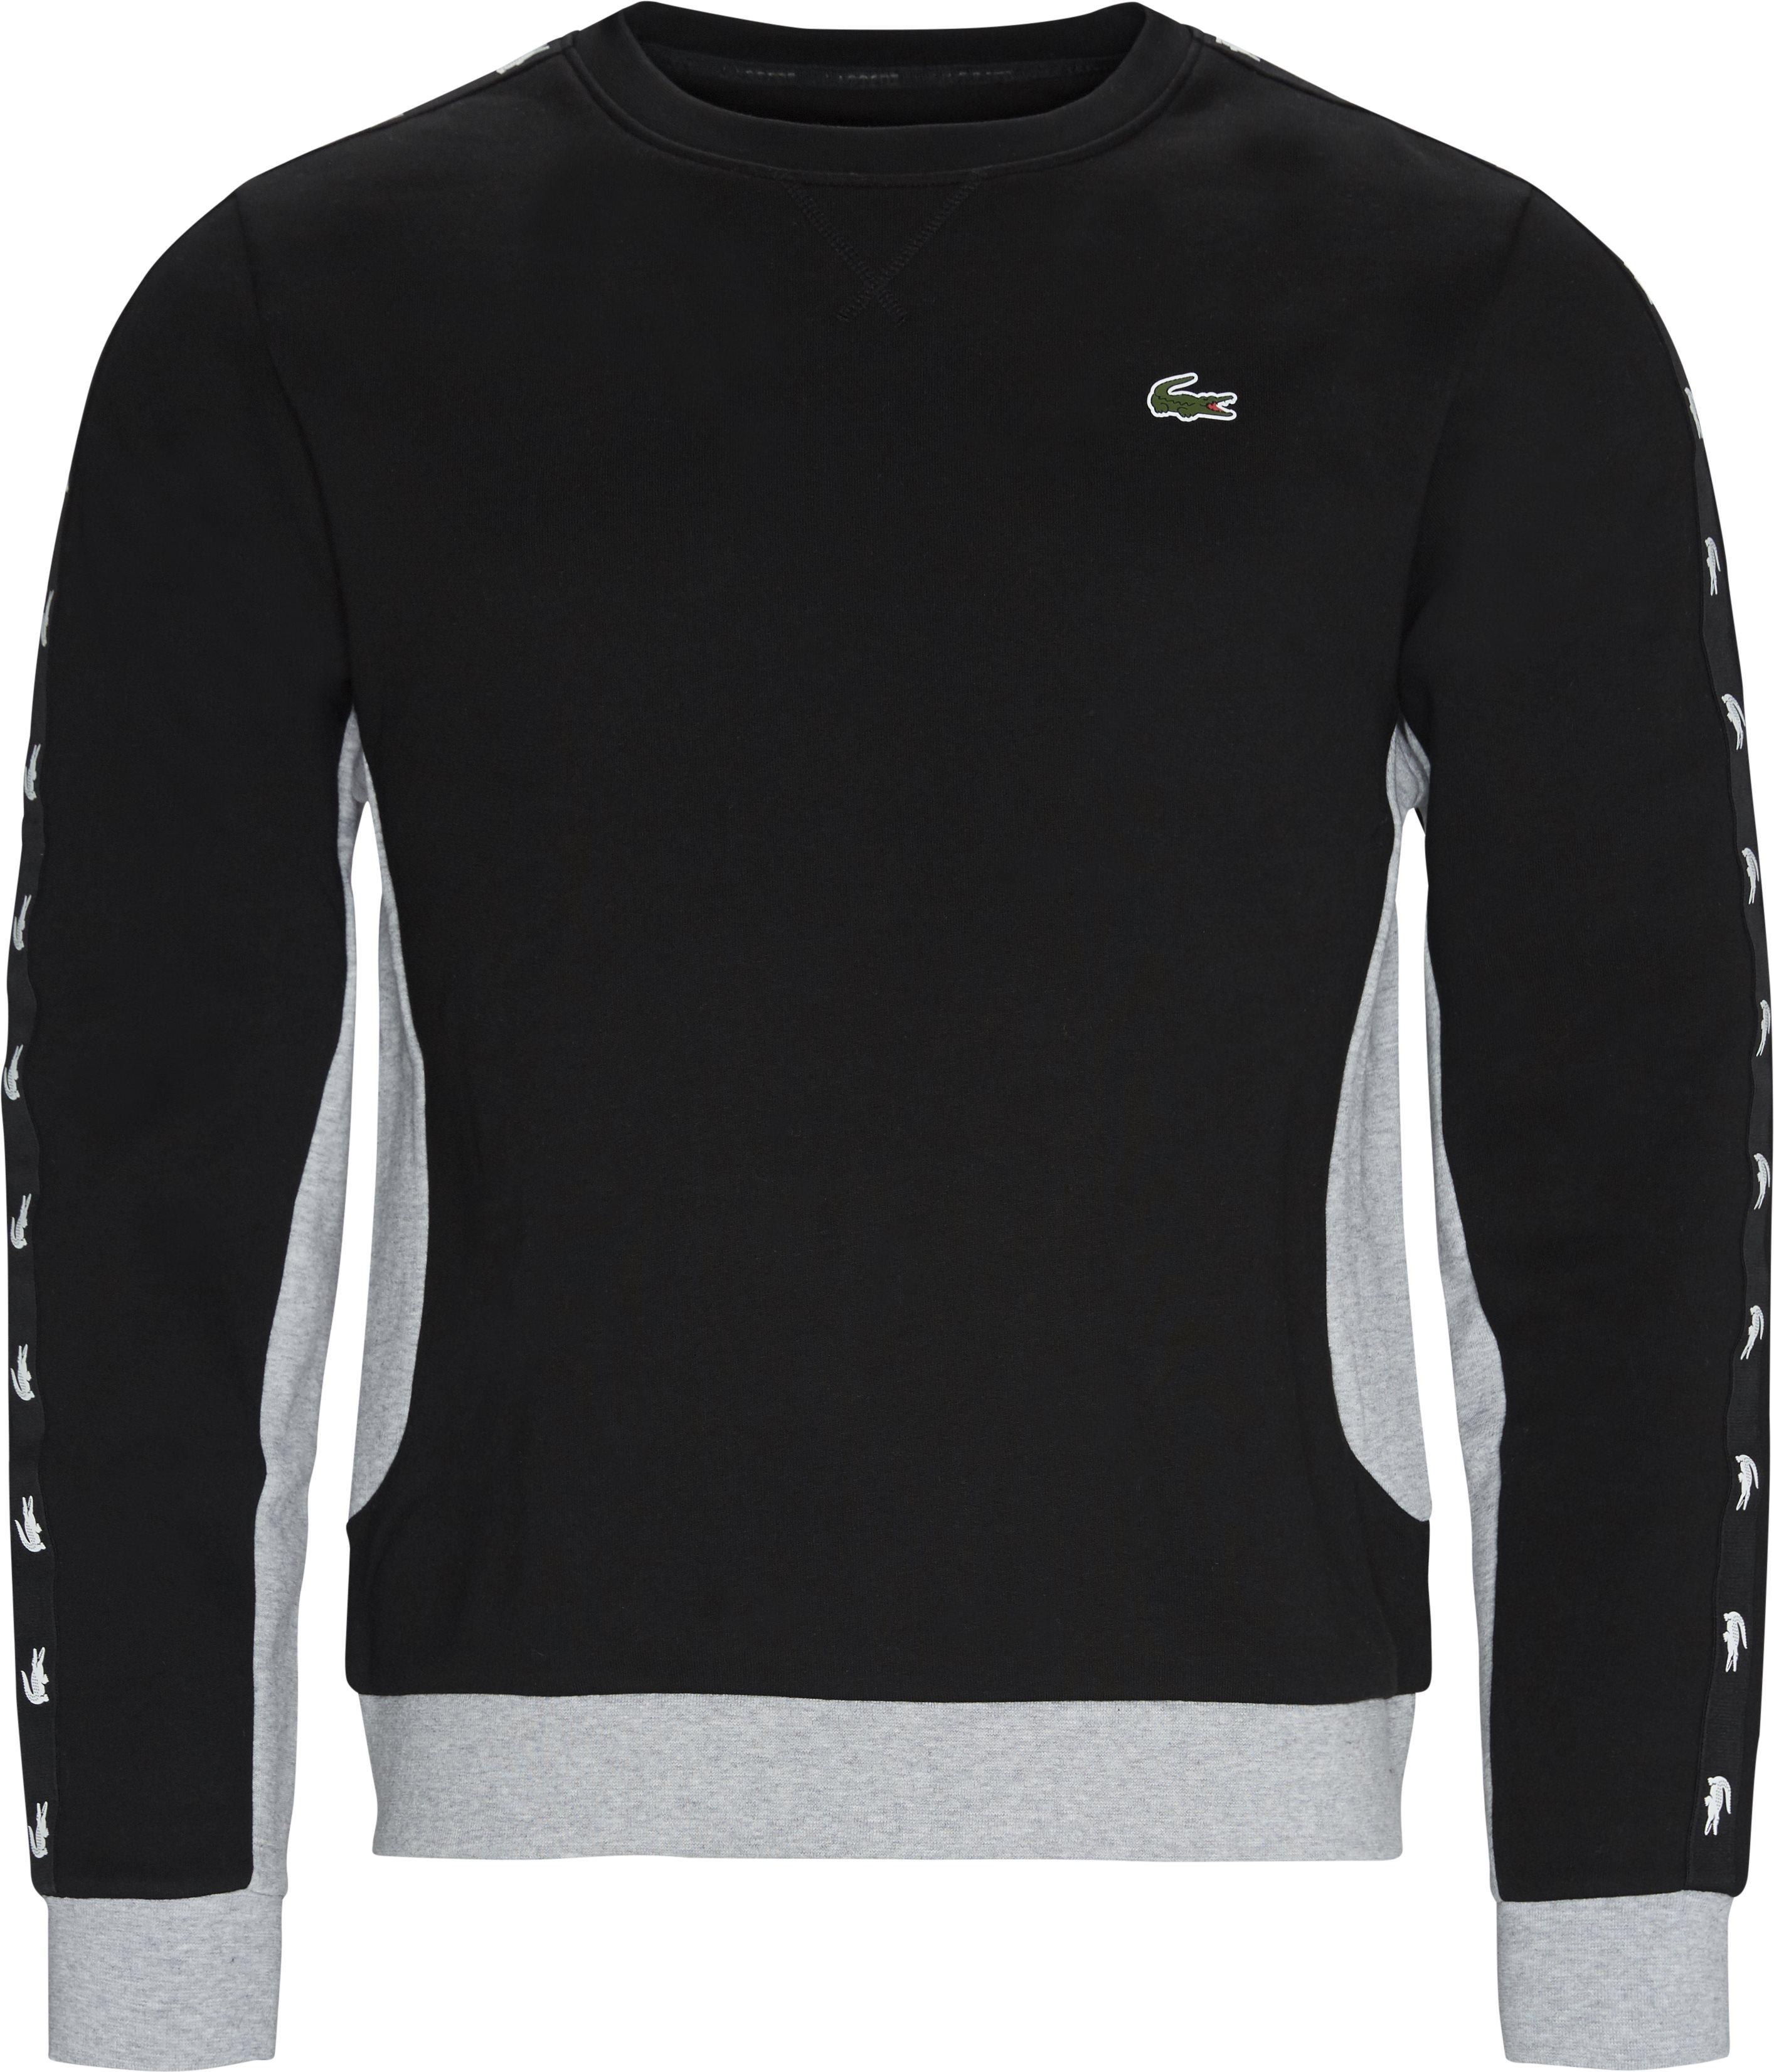 Two-Tone Fleece Crewneck Sweatshirt - Sweatshirts - Regular fit - Sort